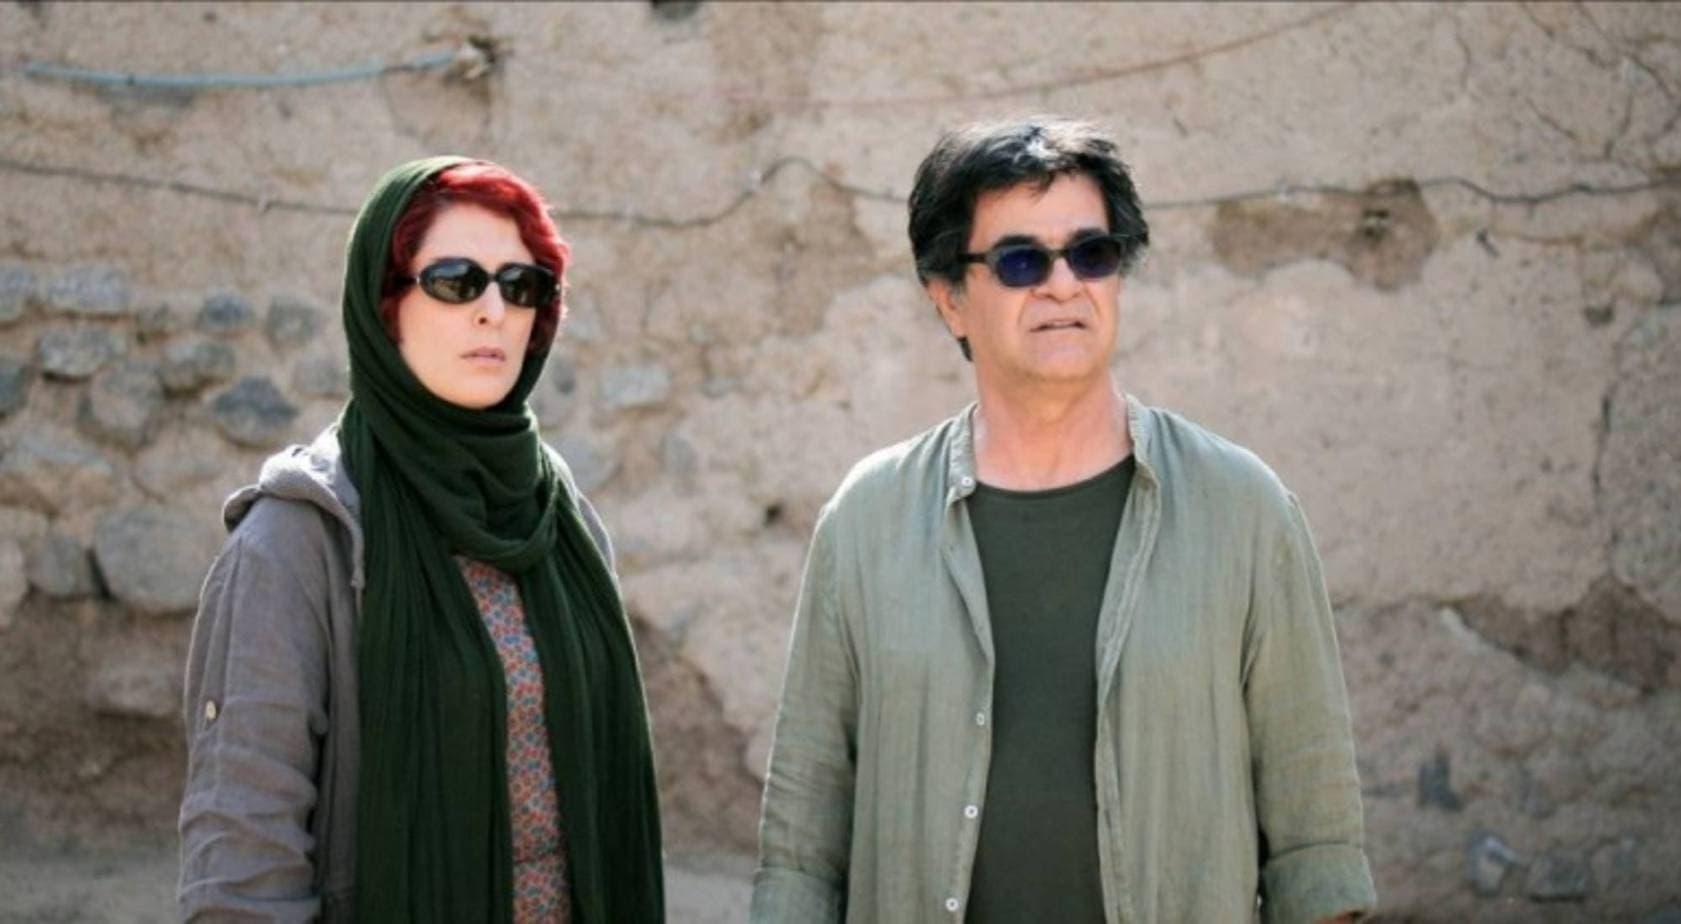 '3 Faces' – a film by Jafar Panahi